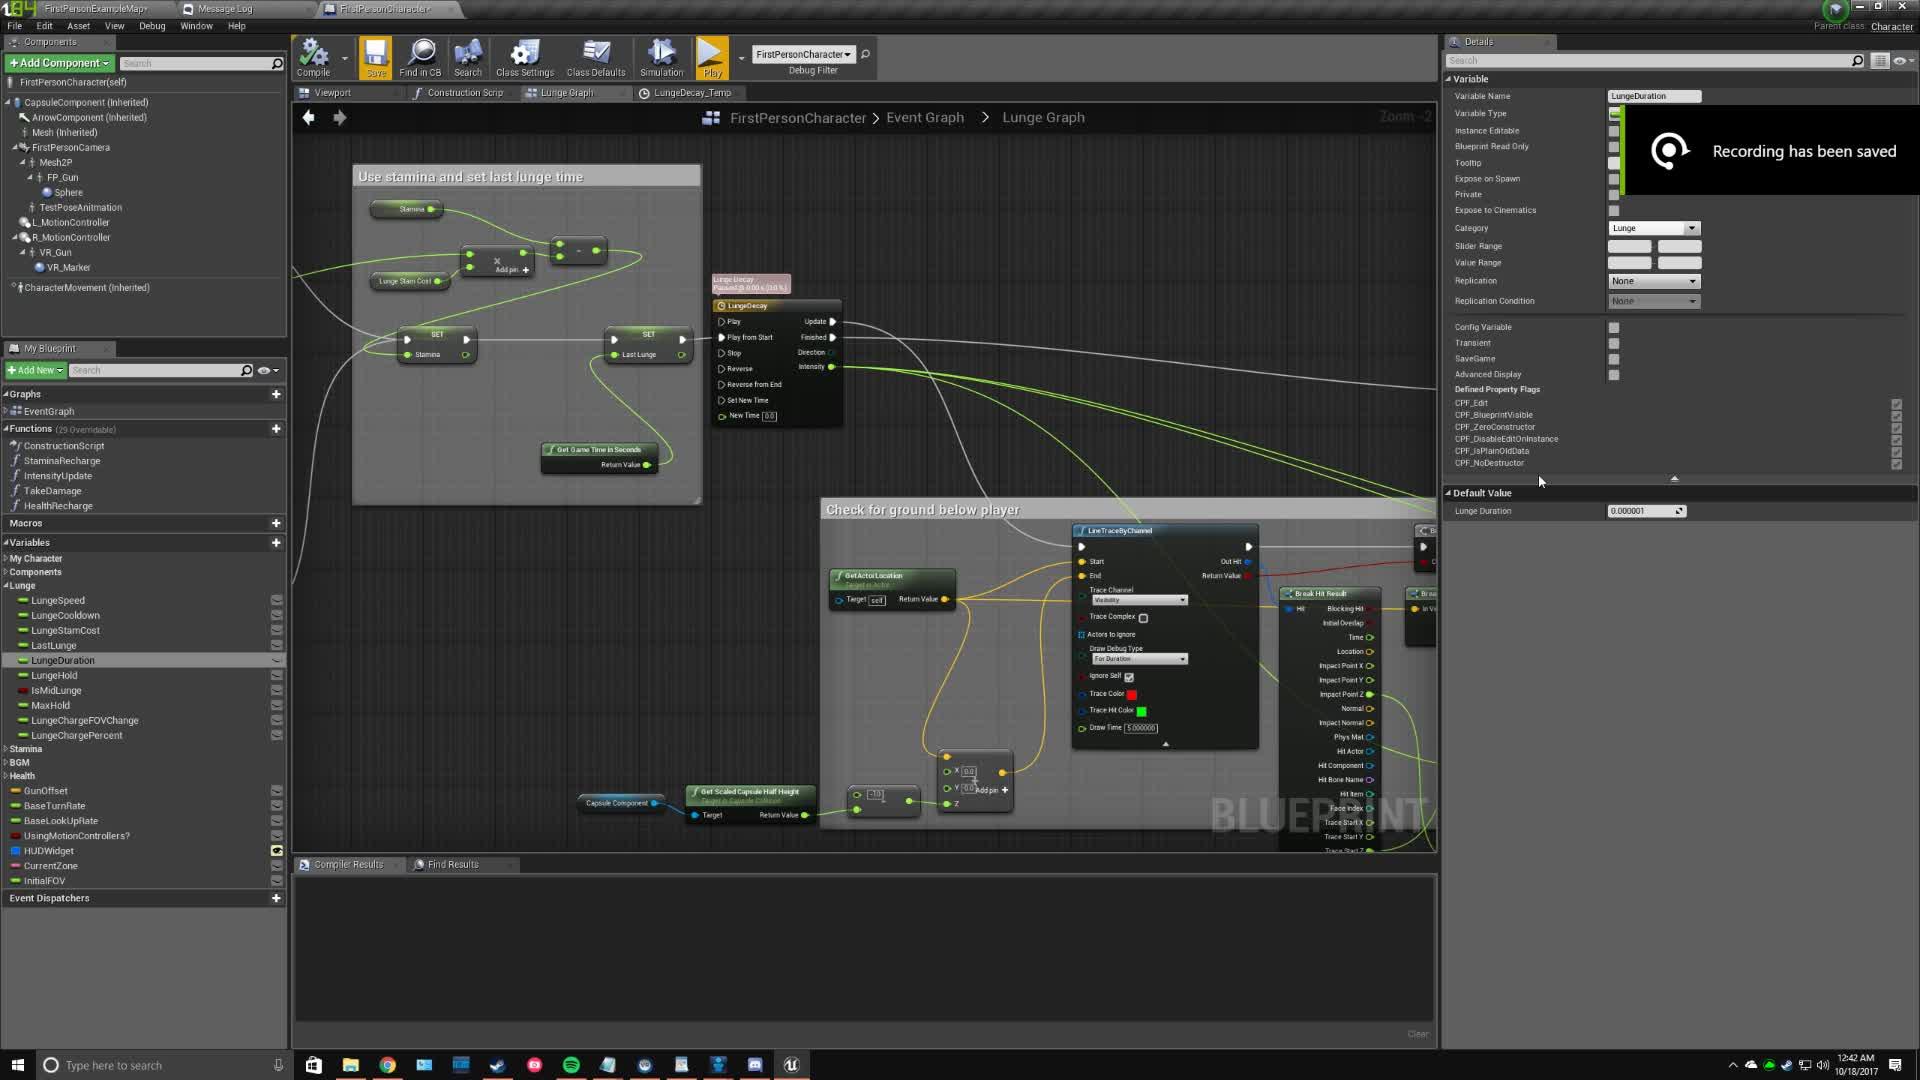 ▷ Unreal Engine Demo 12 01 2017 - 01 33 27 05 GIF by veloxiac